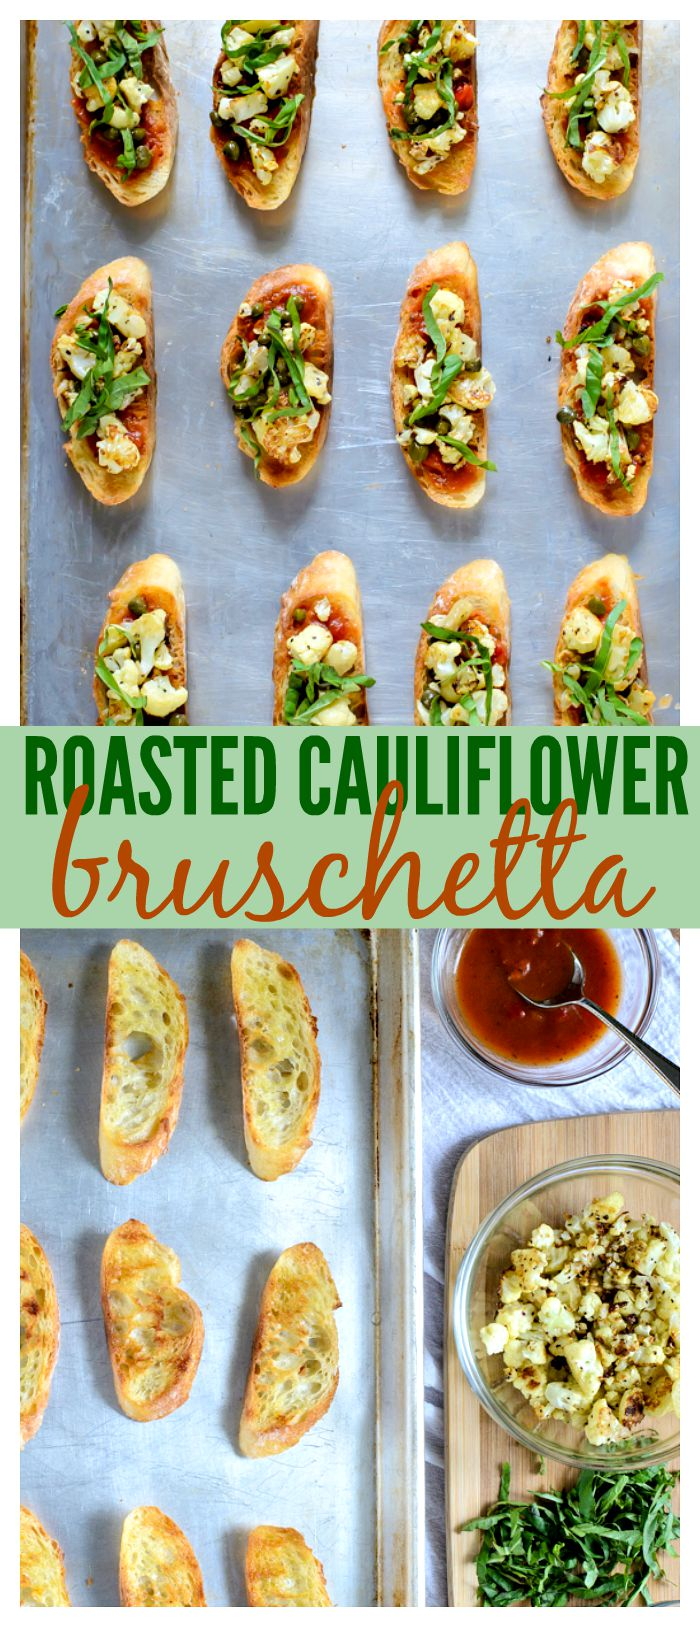 Roasted Cauliflower Bruschetta // Well-Plated